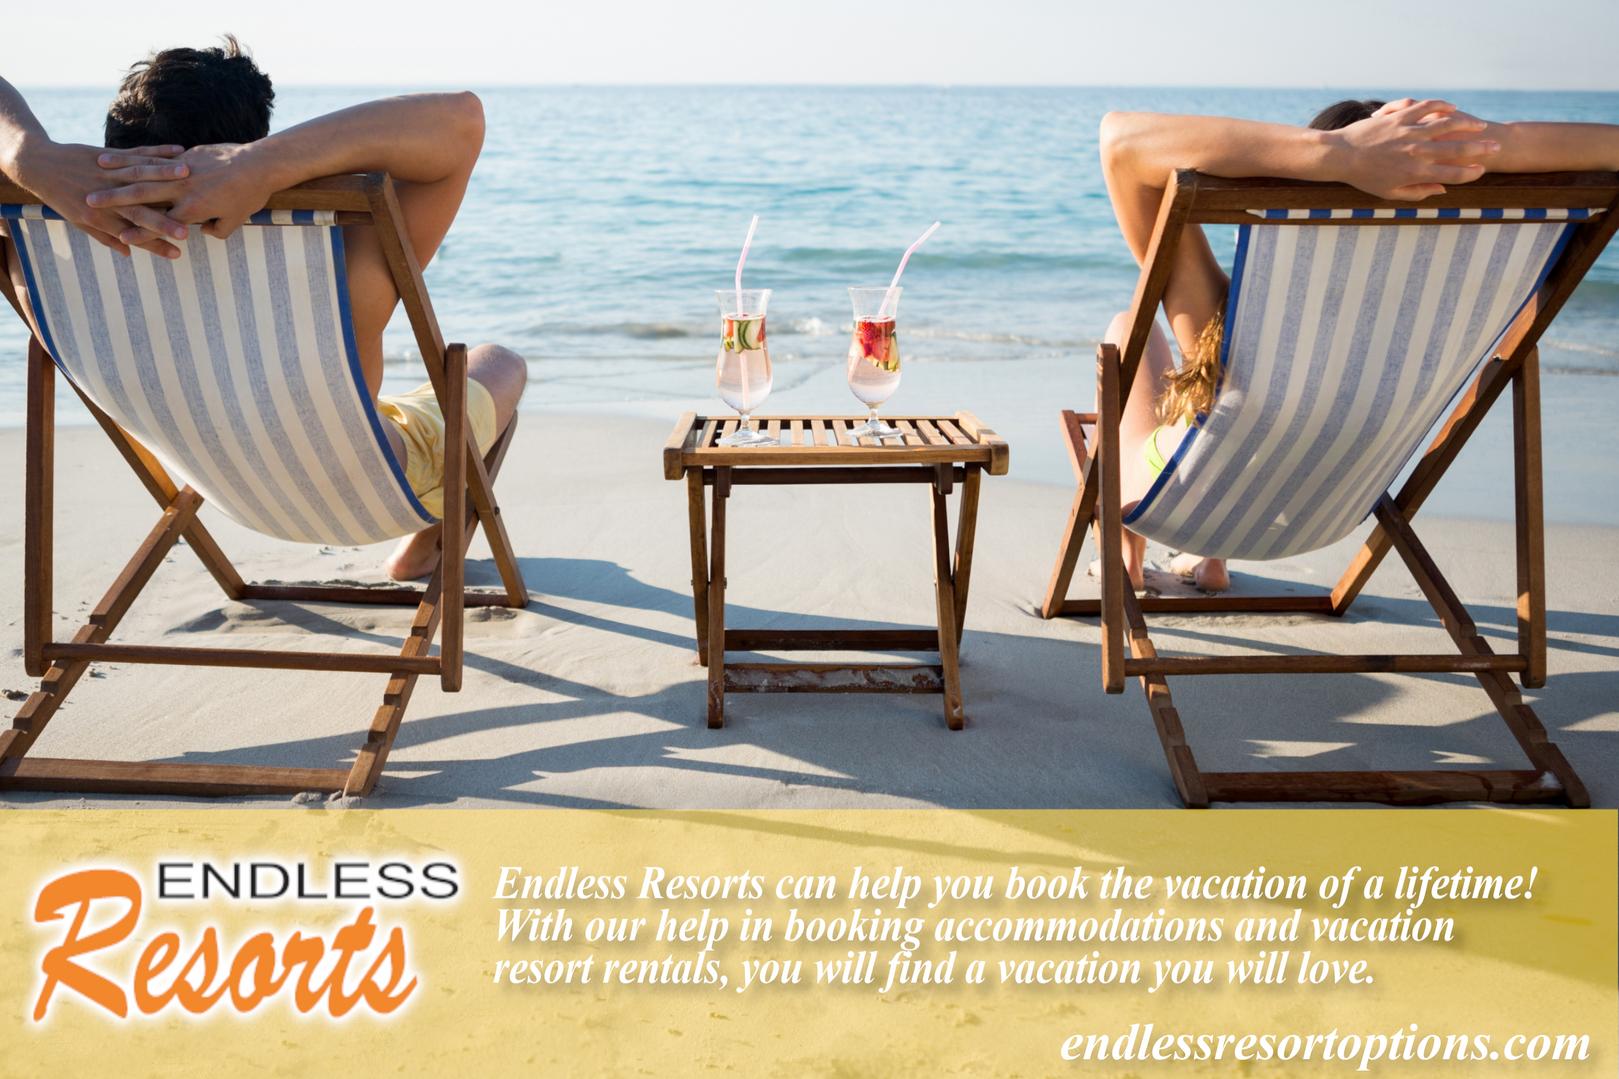 Endless resort options.png